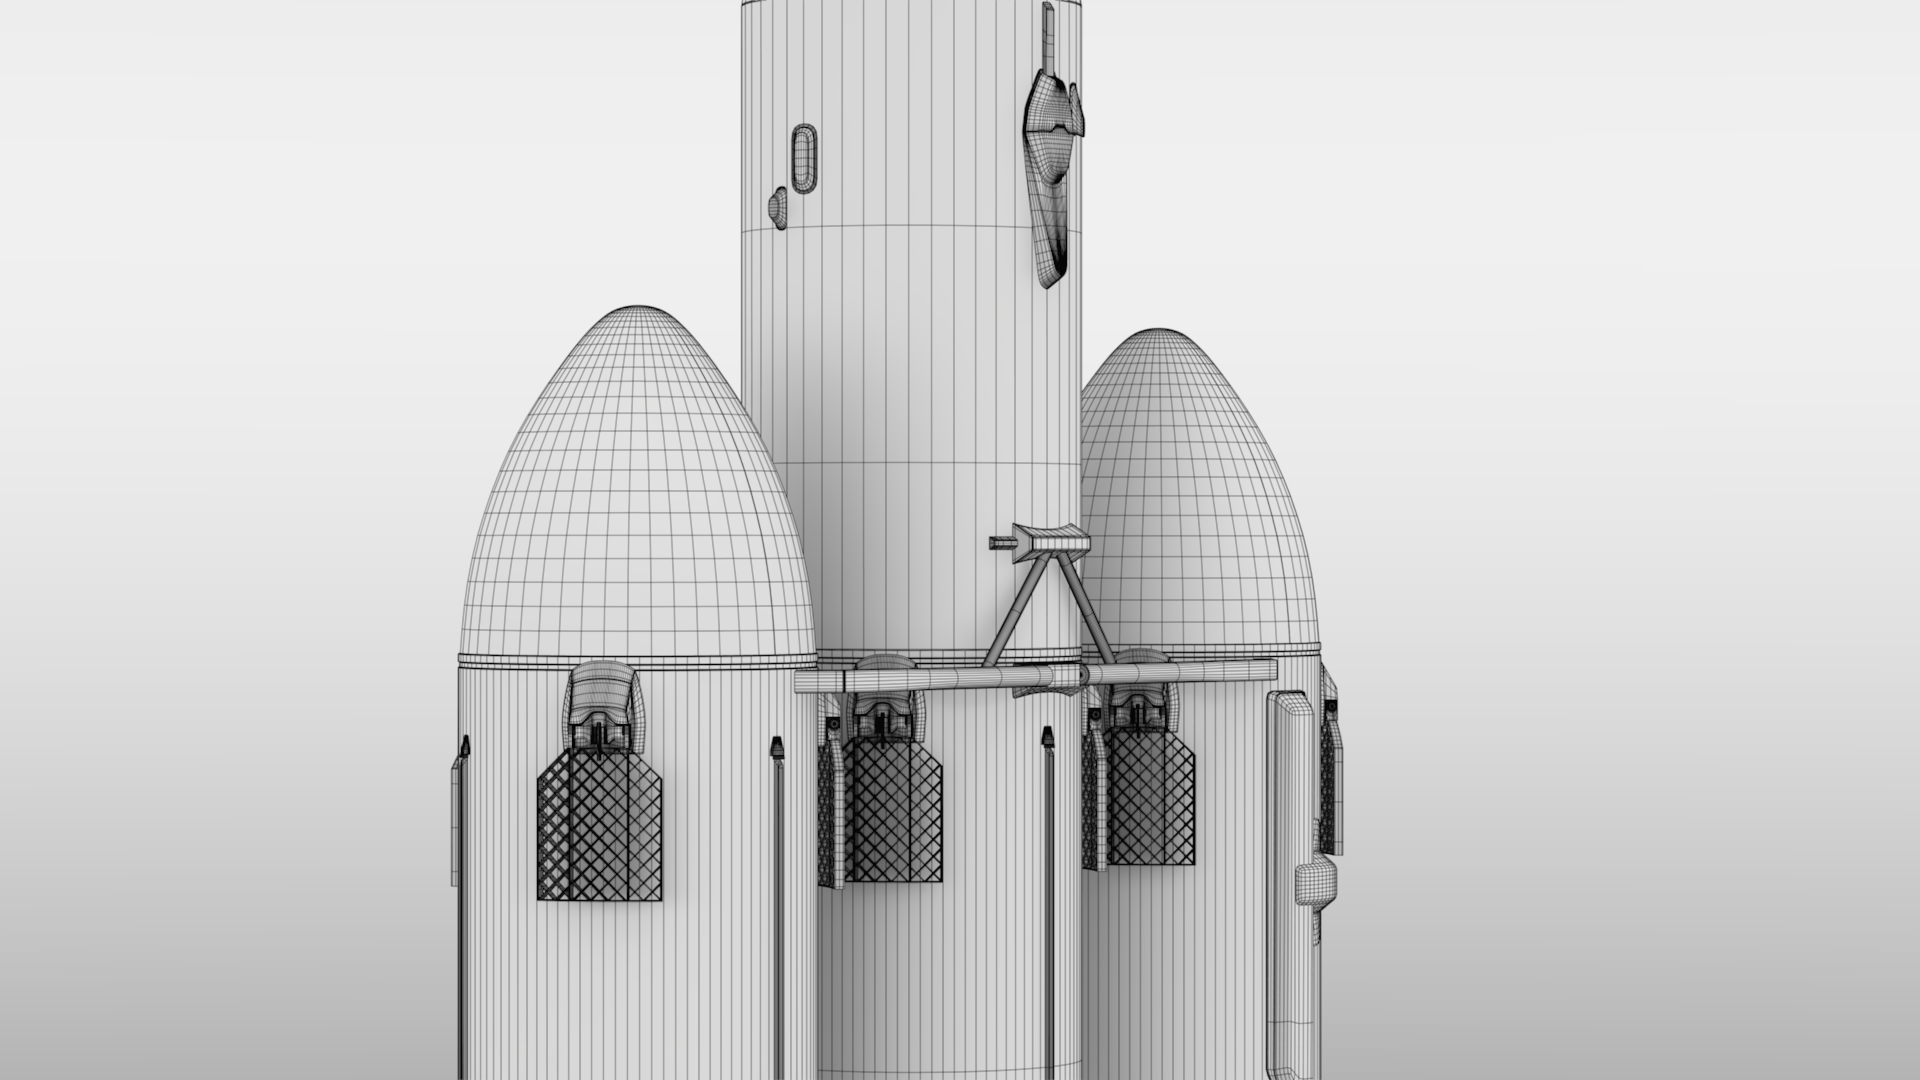 falcon heavy v1.2 fully reusable 3d model max fbx c4d lwo ma mb hrc xsi obj 277873